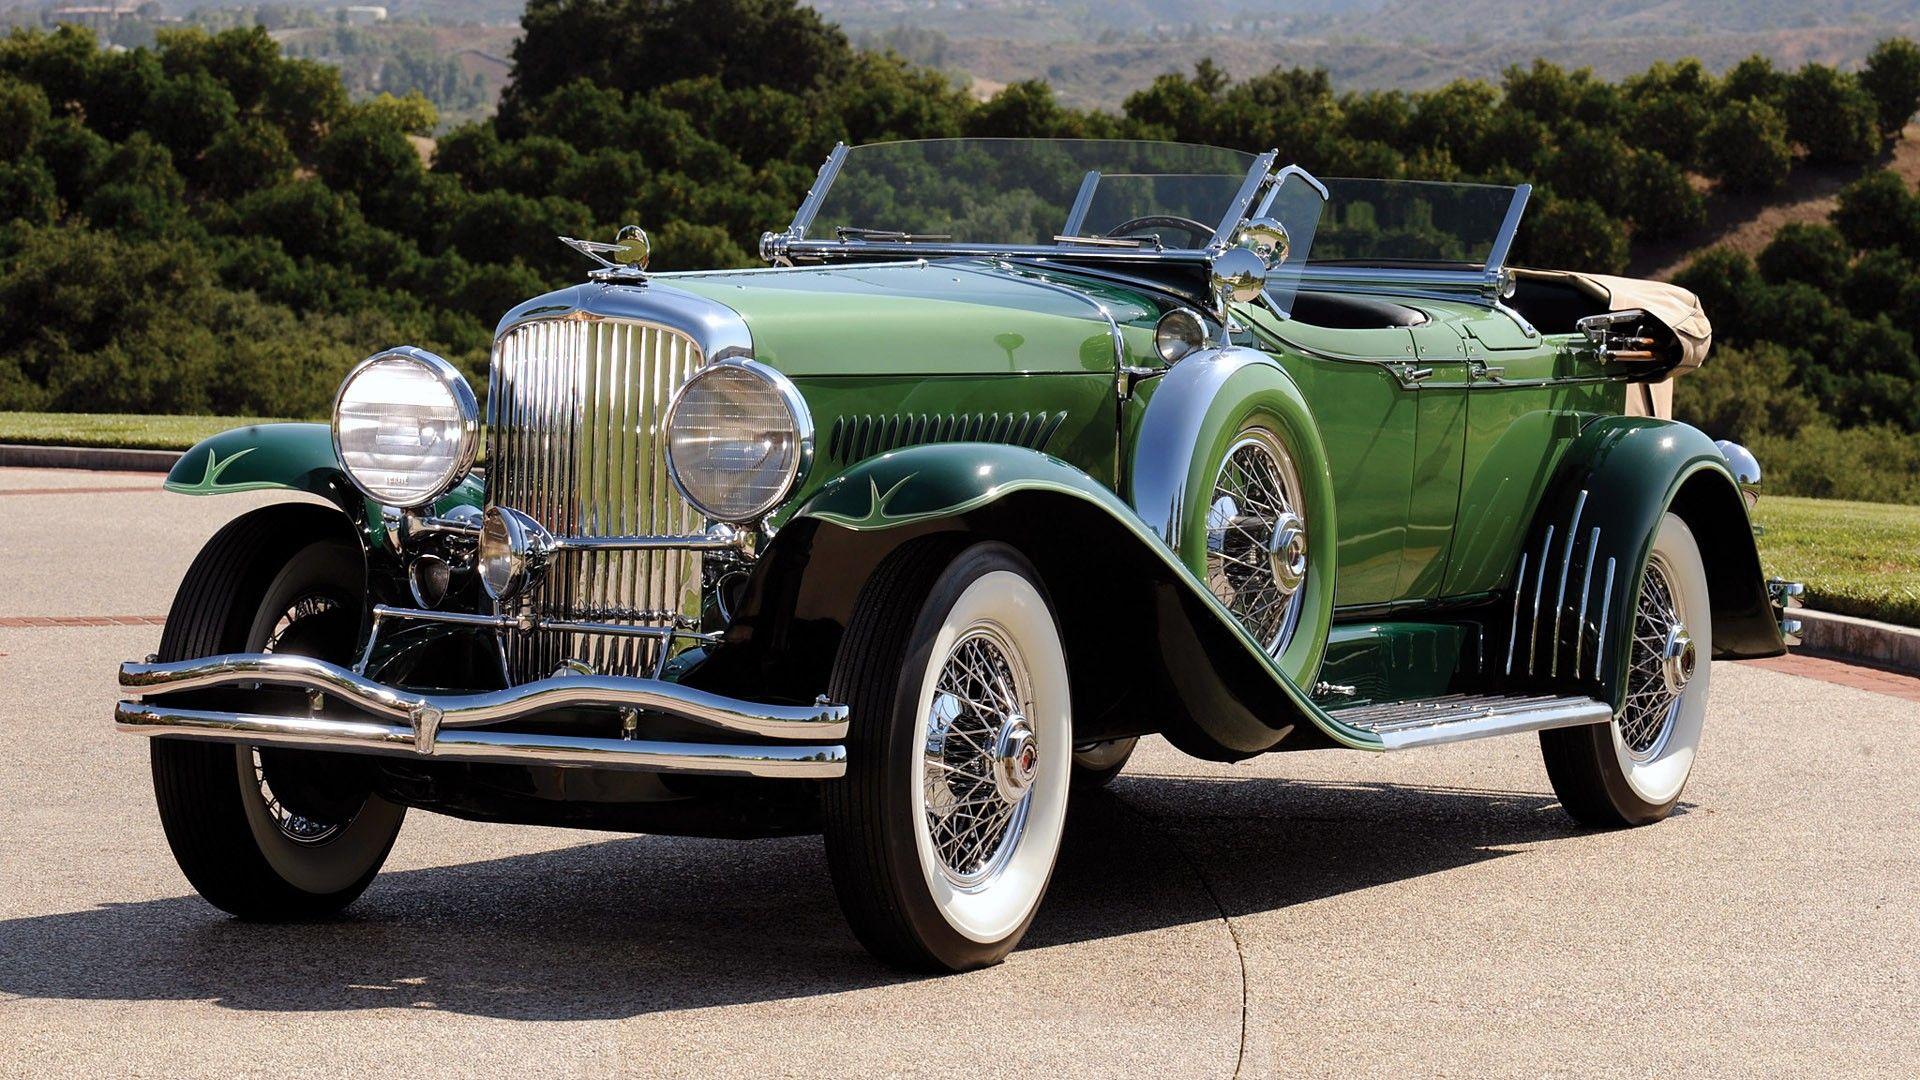 Autos Clásicos Excelente Cars Sweet Cars And Duesenberg Car - Classic car 1930